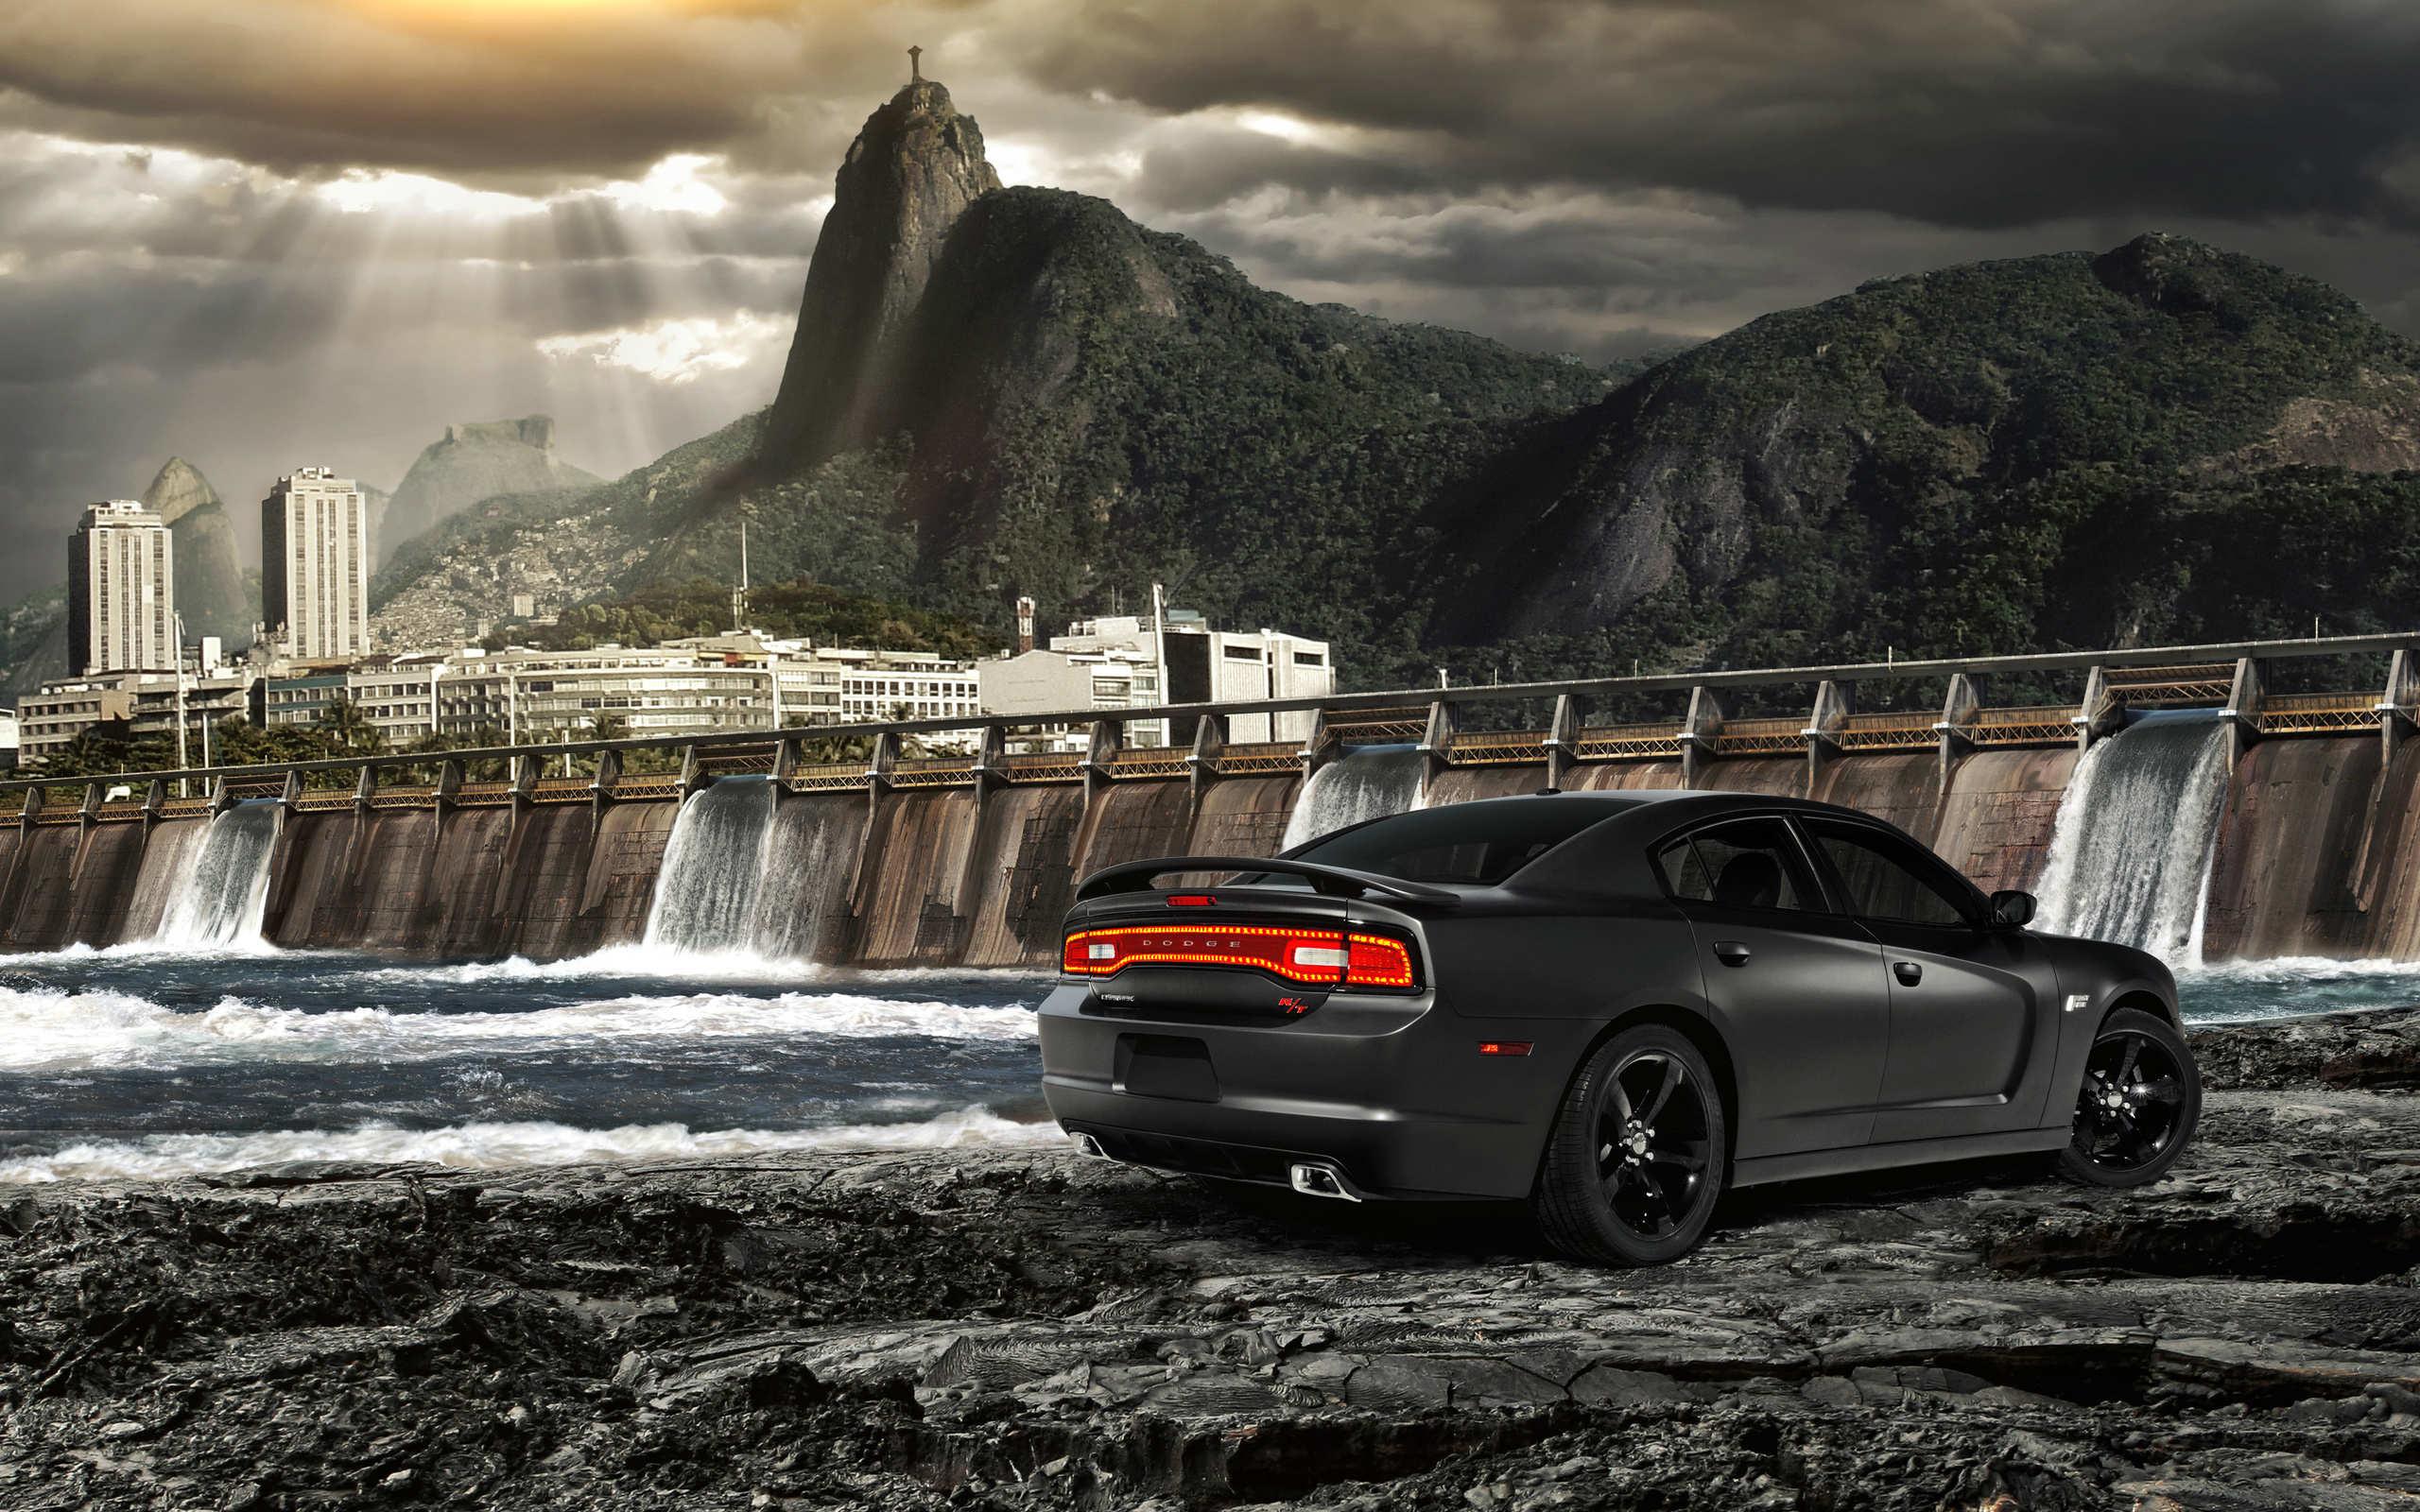 2014 Black Dodge Charger Wallpaper – HD